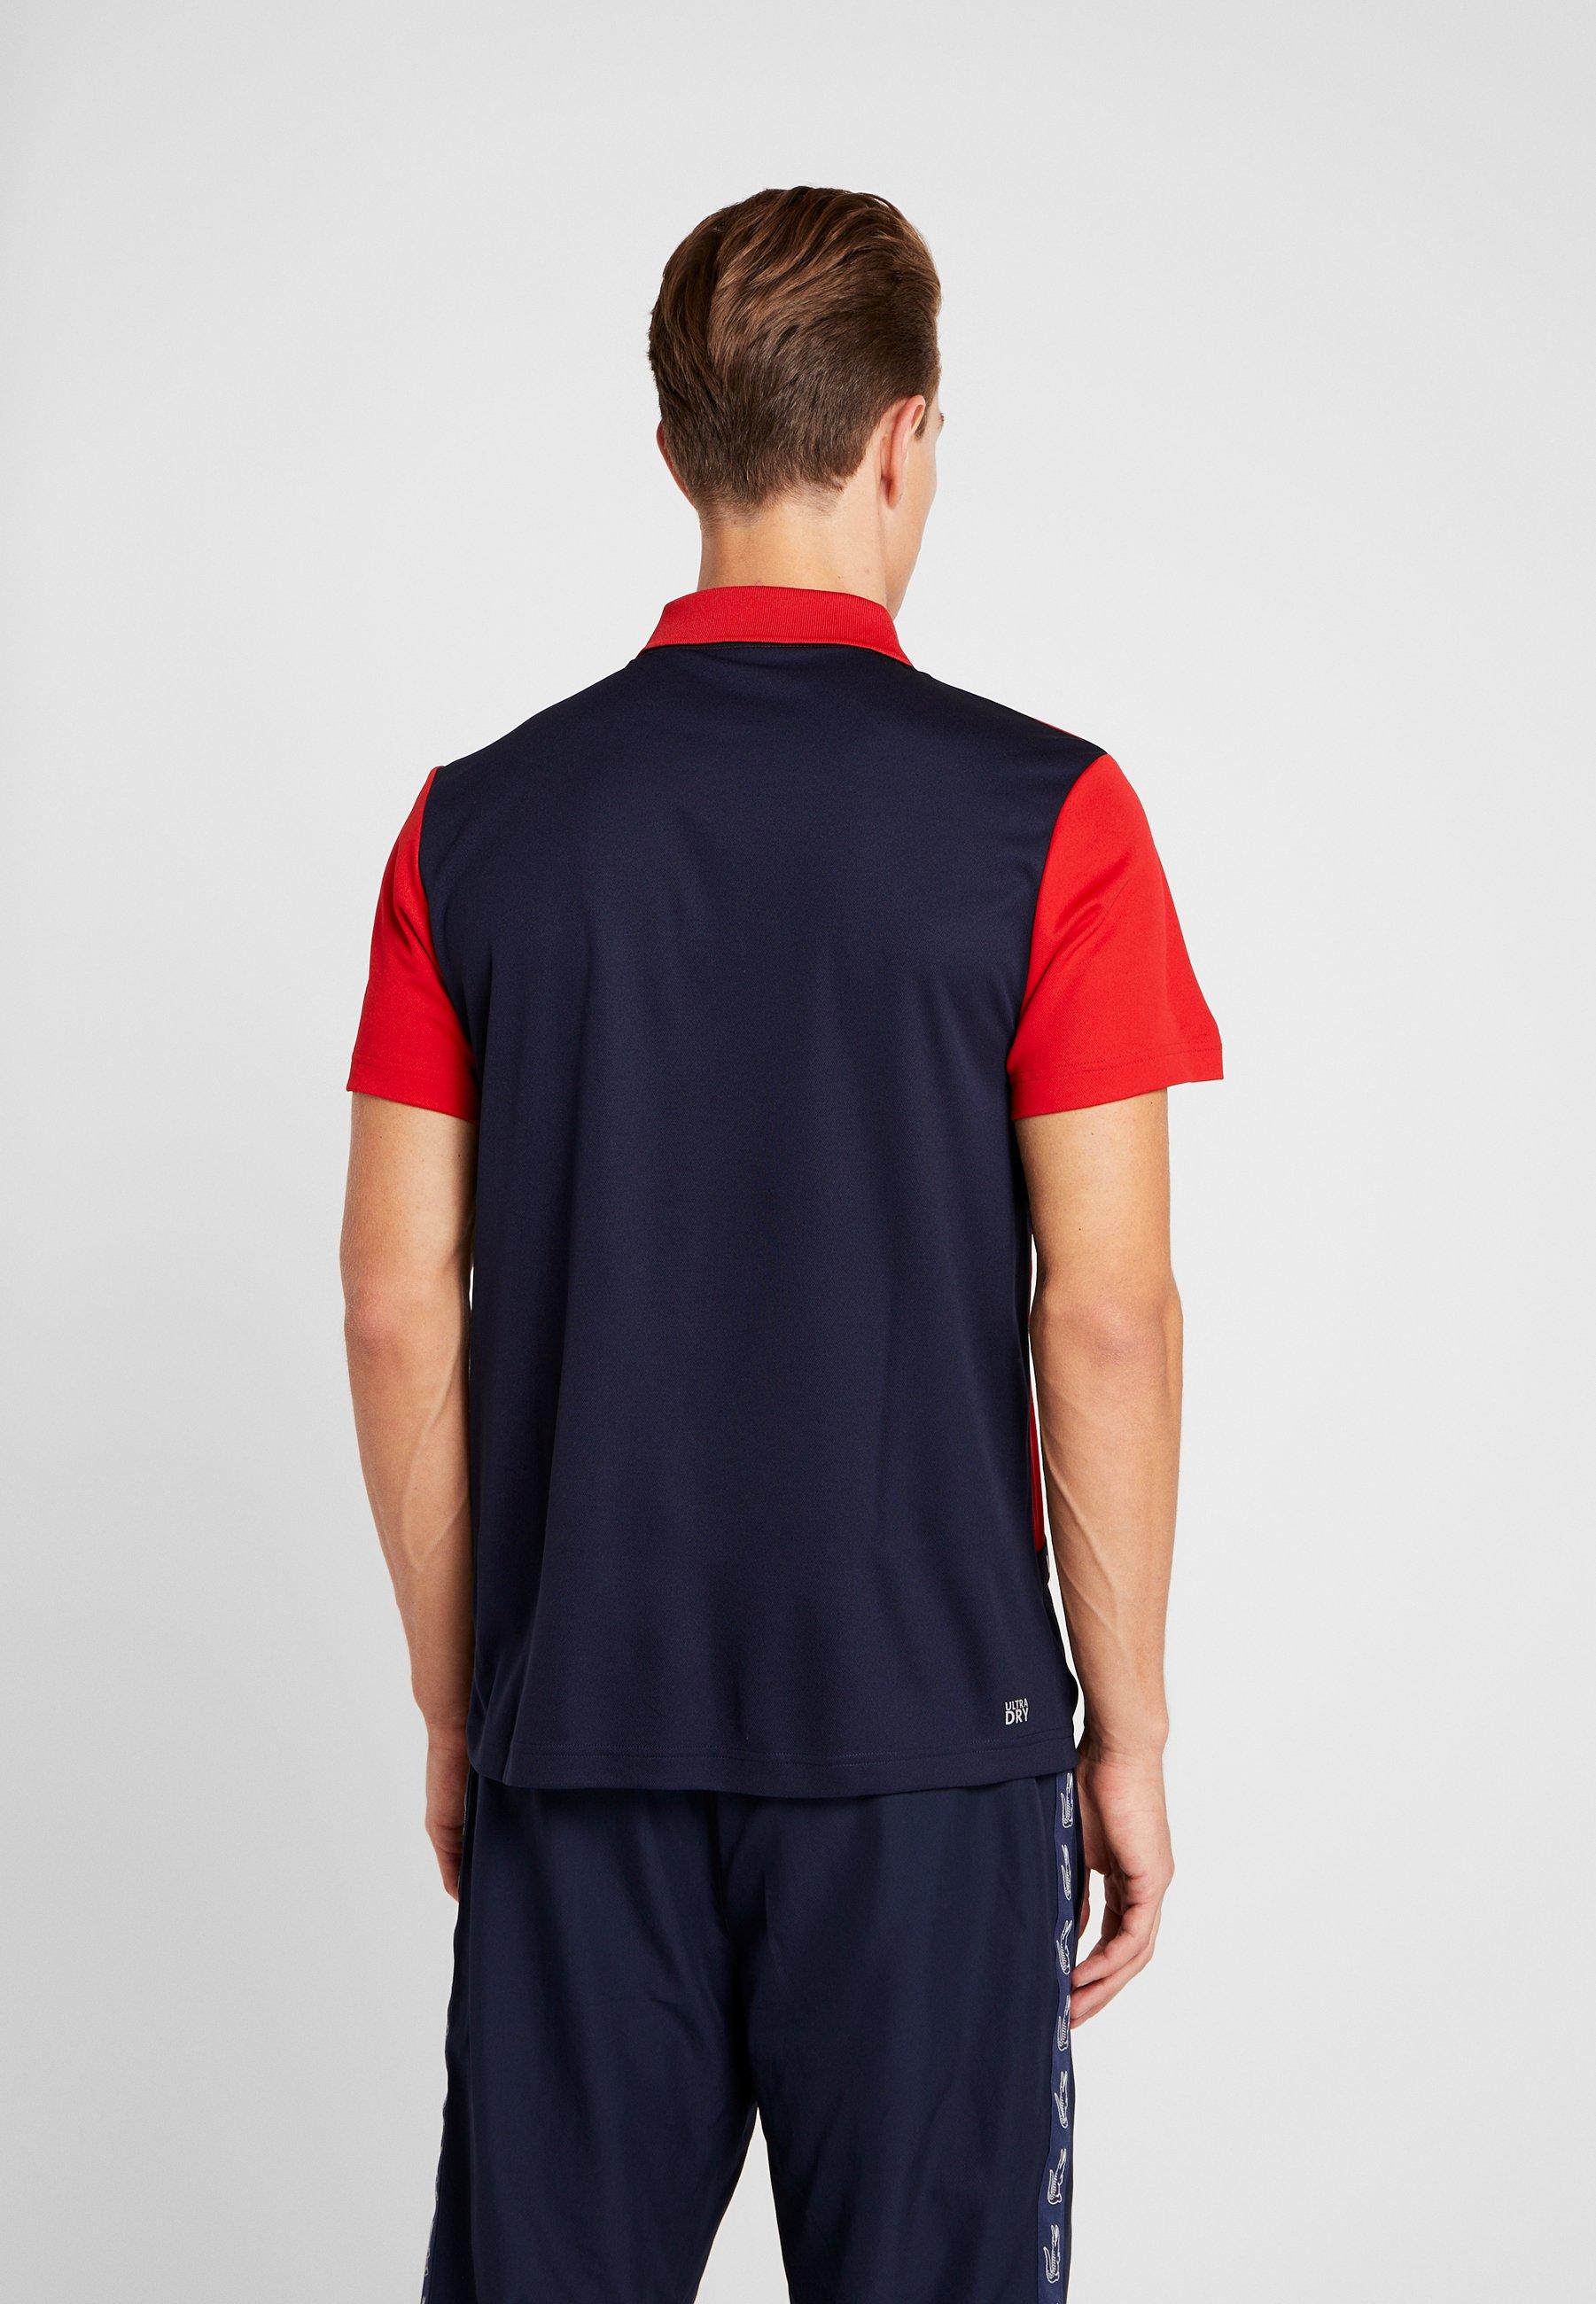 TaperedT Red navy Blue Lacoste Sport Tennis De shirt b6y7fYg